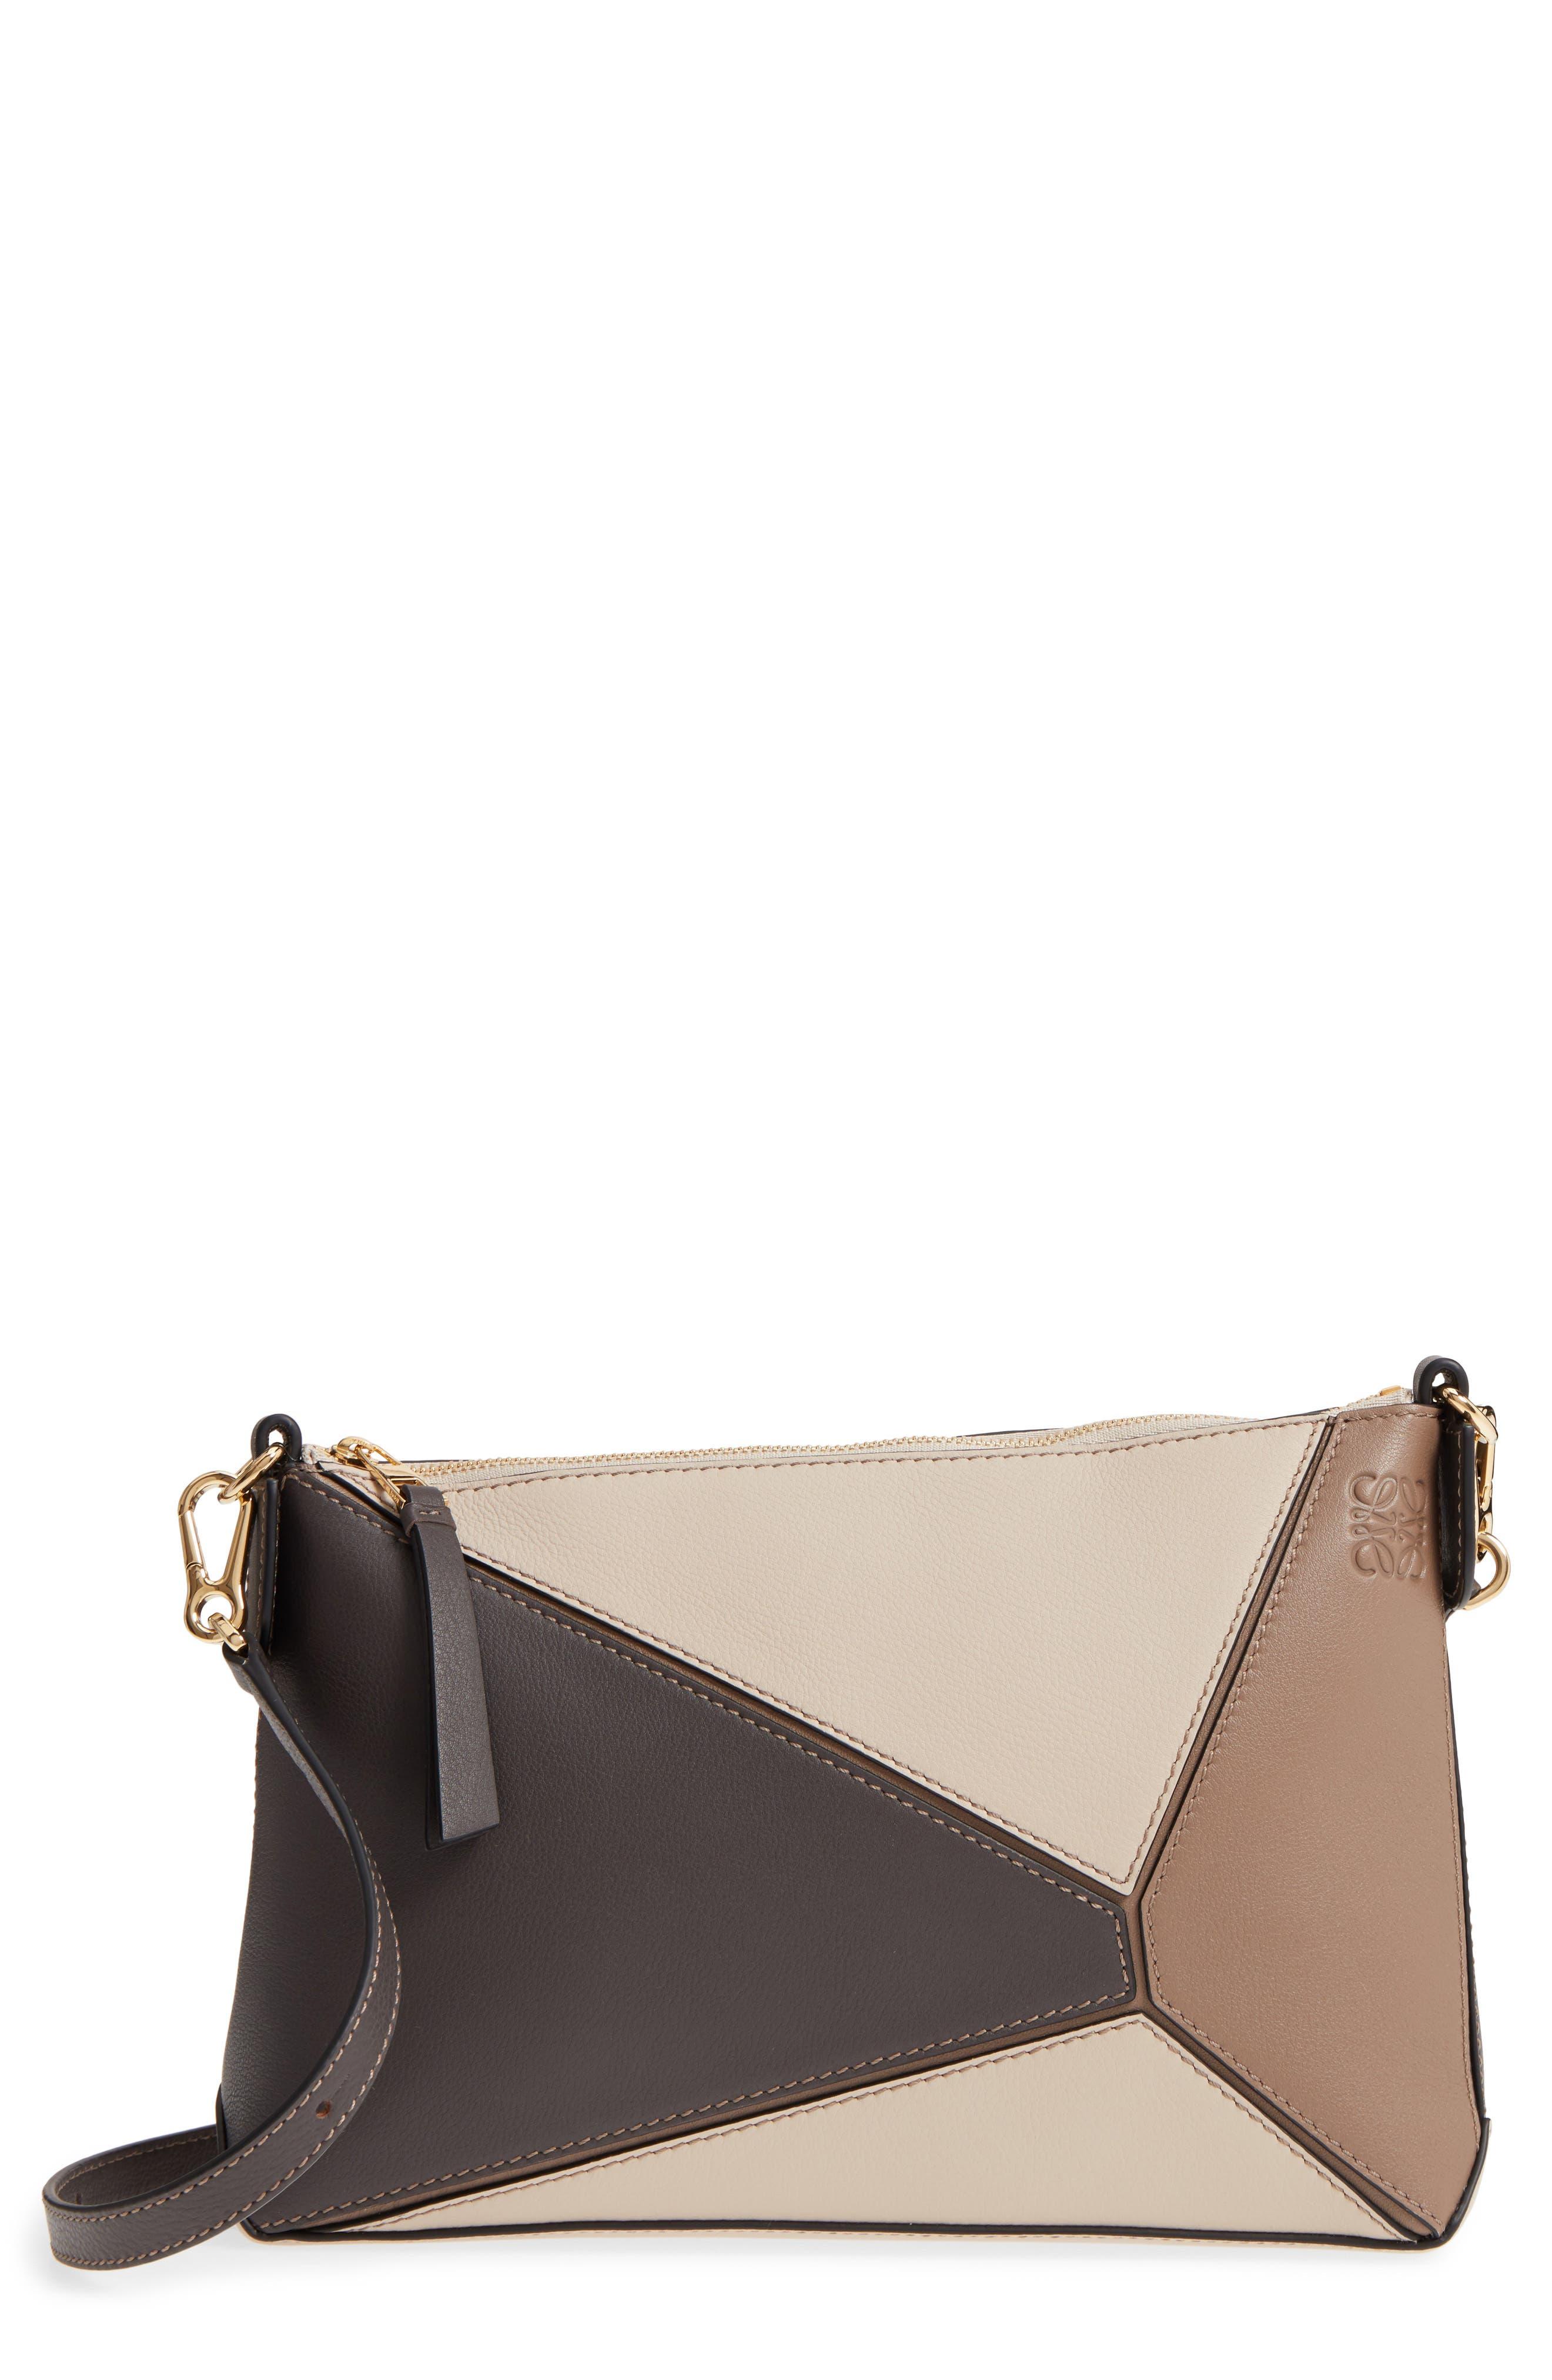 Mini Puzzle Calfskin Leather Crossbody Bag,                         Main,                         color, DARK TAUPE MULTITONE